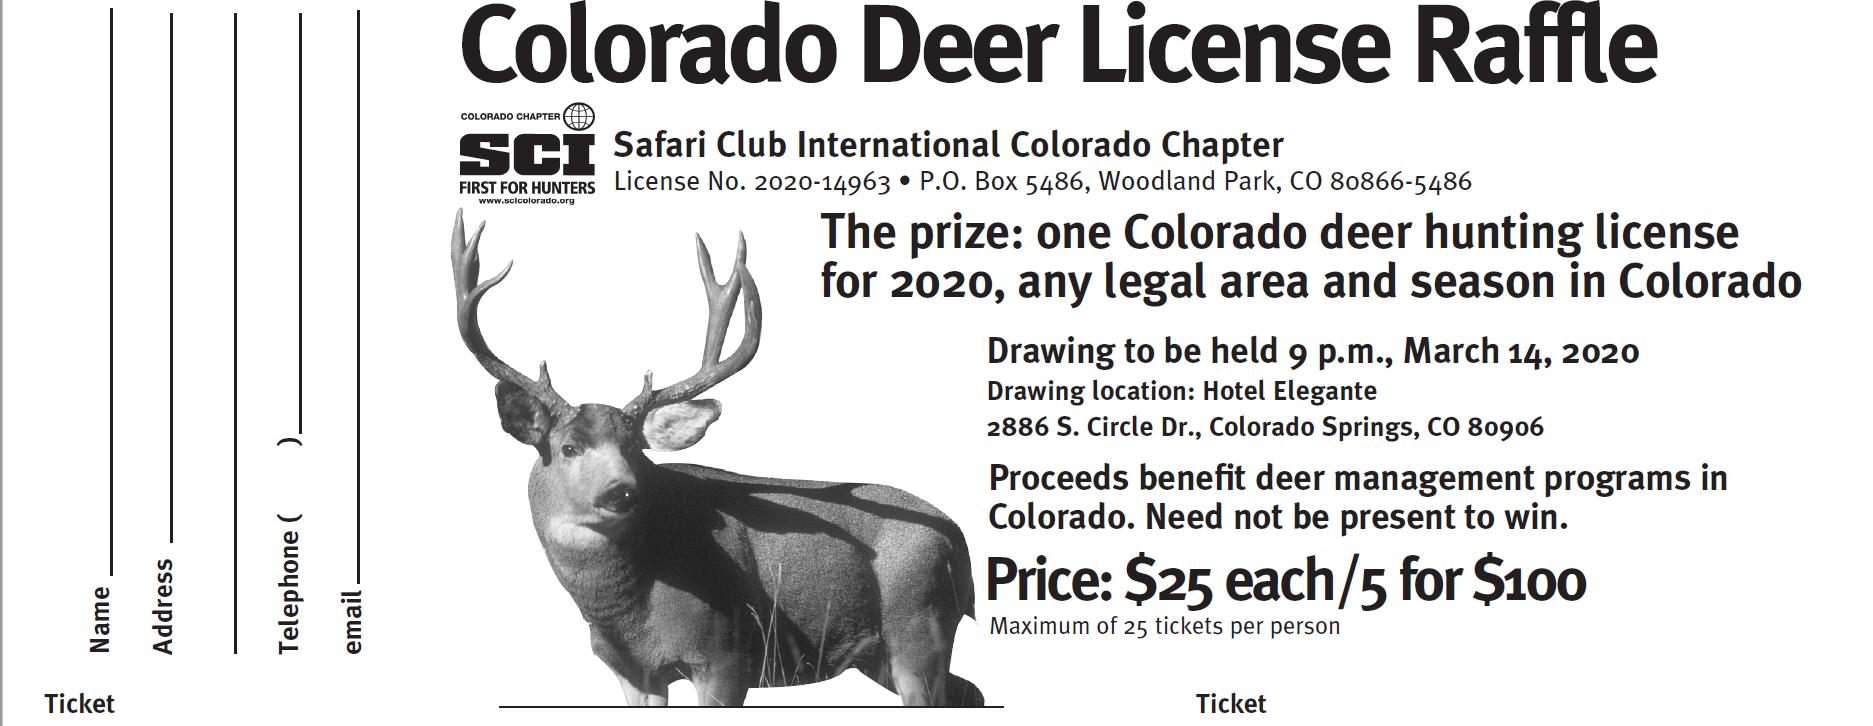 Statewide Deer License Raffle - 1 Ticket